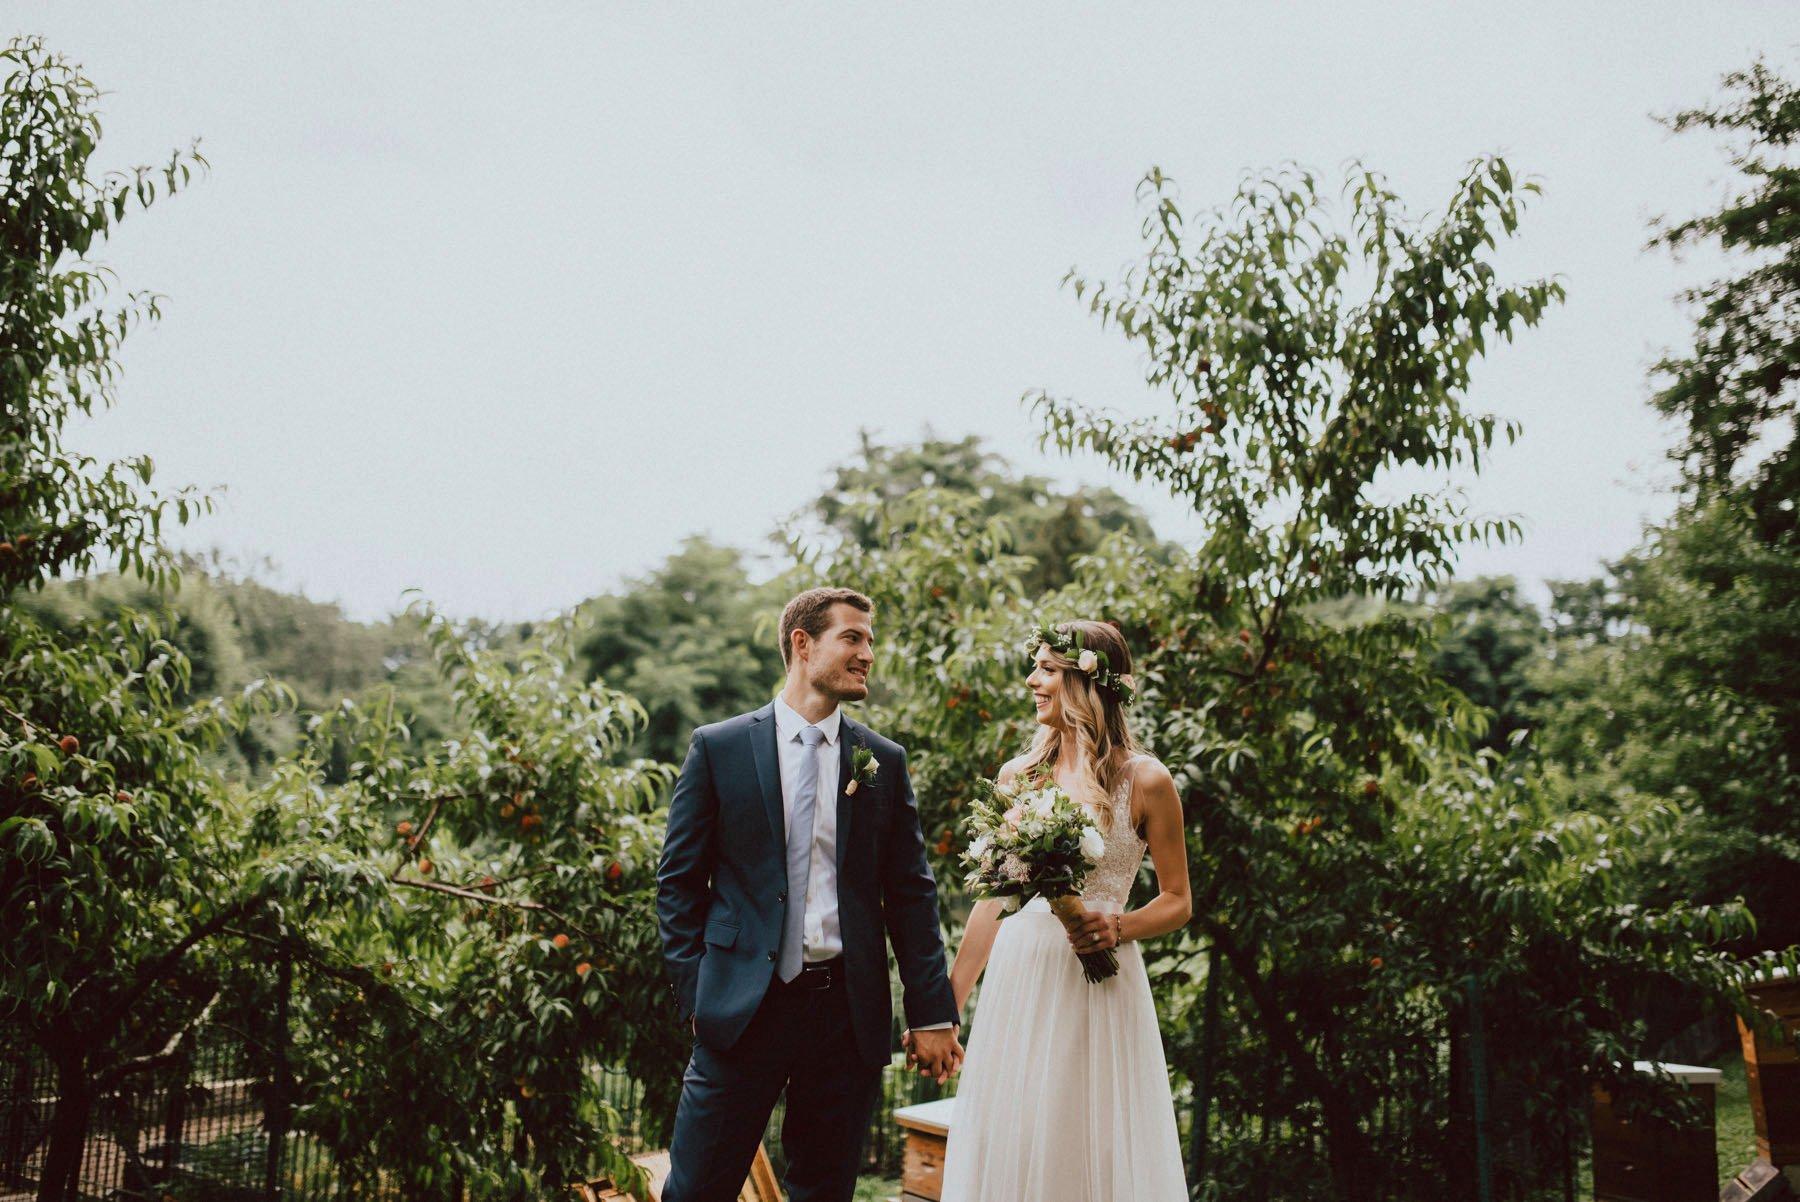 Knowlton-mansion-wedding-75.jpg